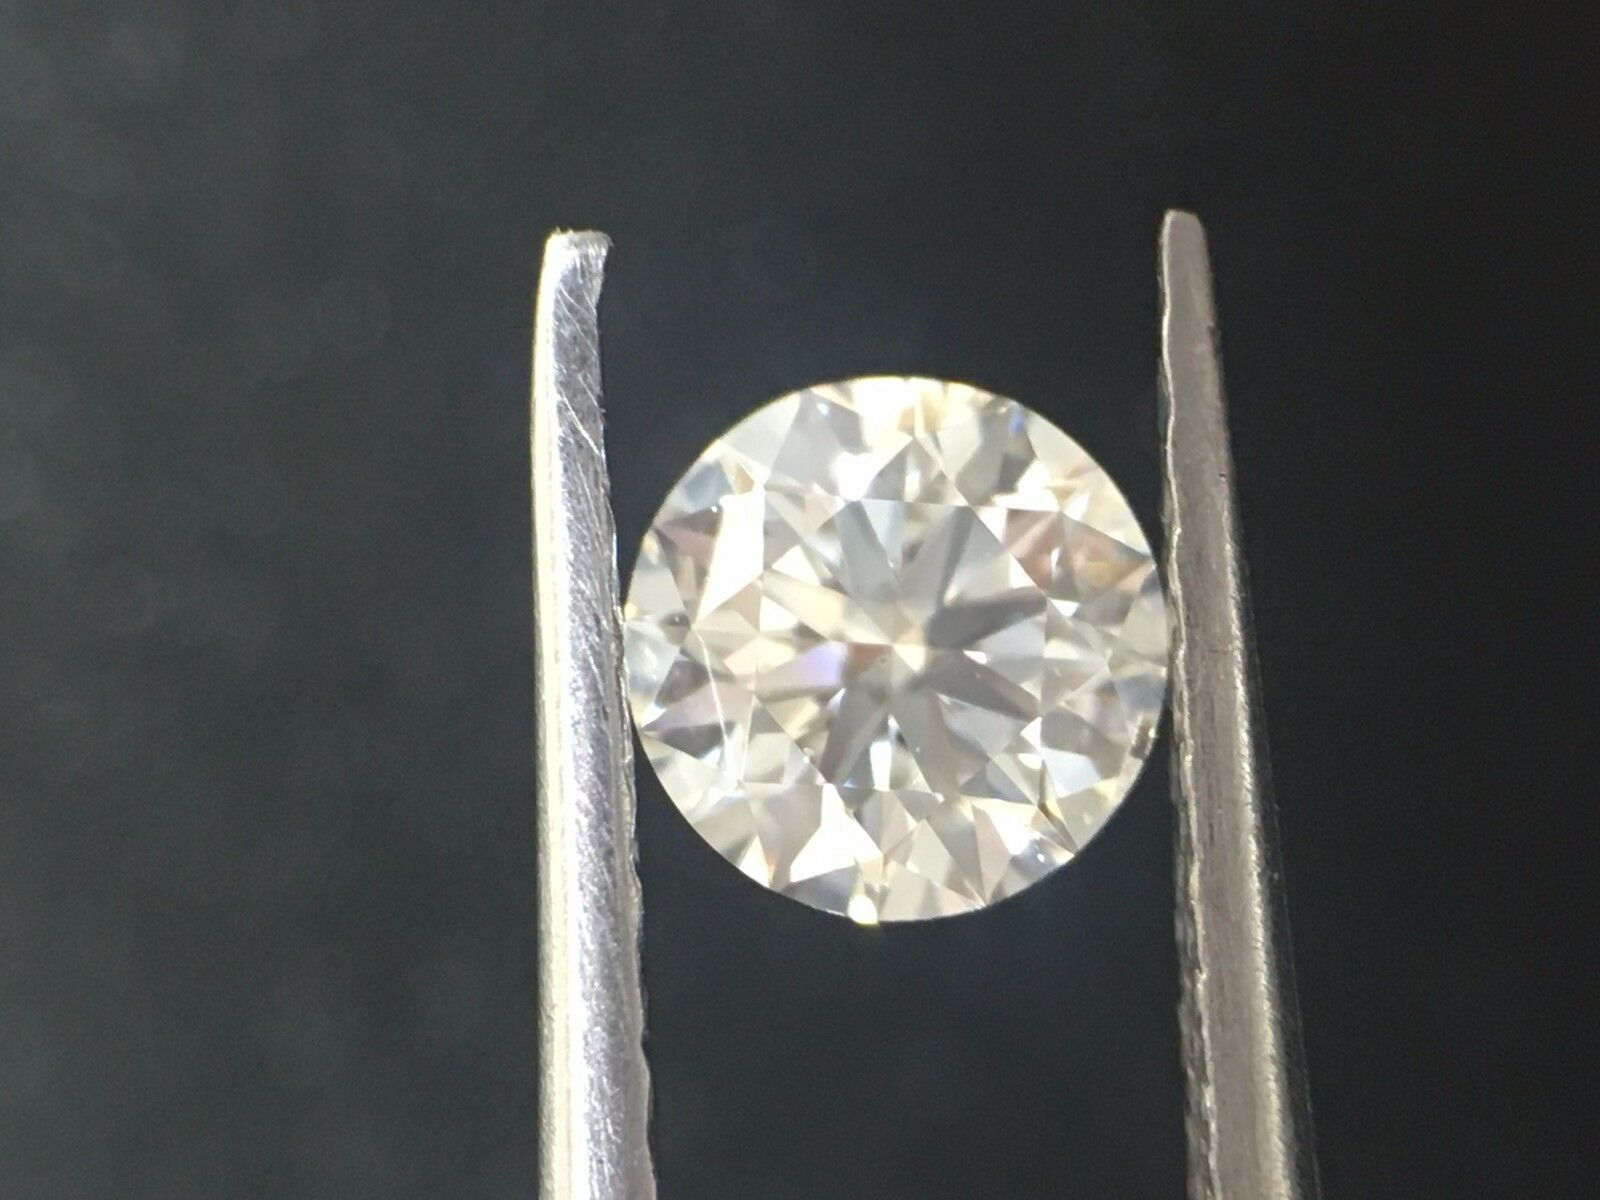 GIA Certified 0.32 Ct Carat G SI2 Loose Natural Beautiful Diamond with Appraisal